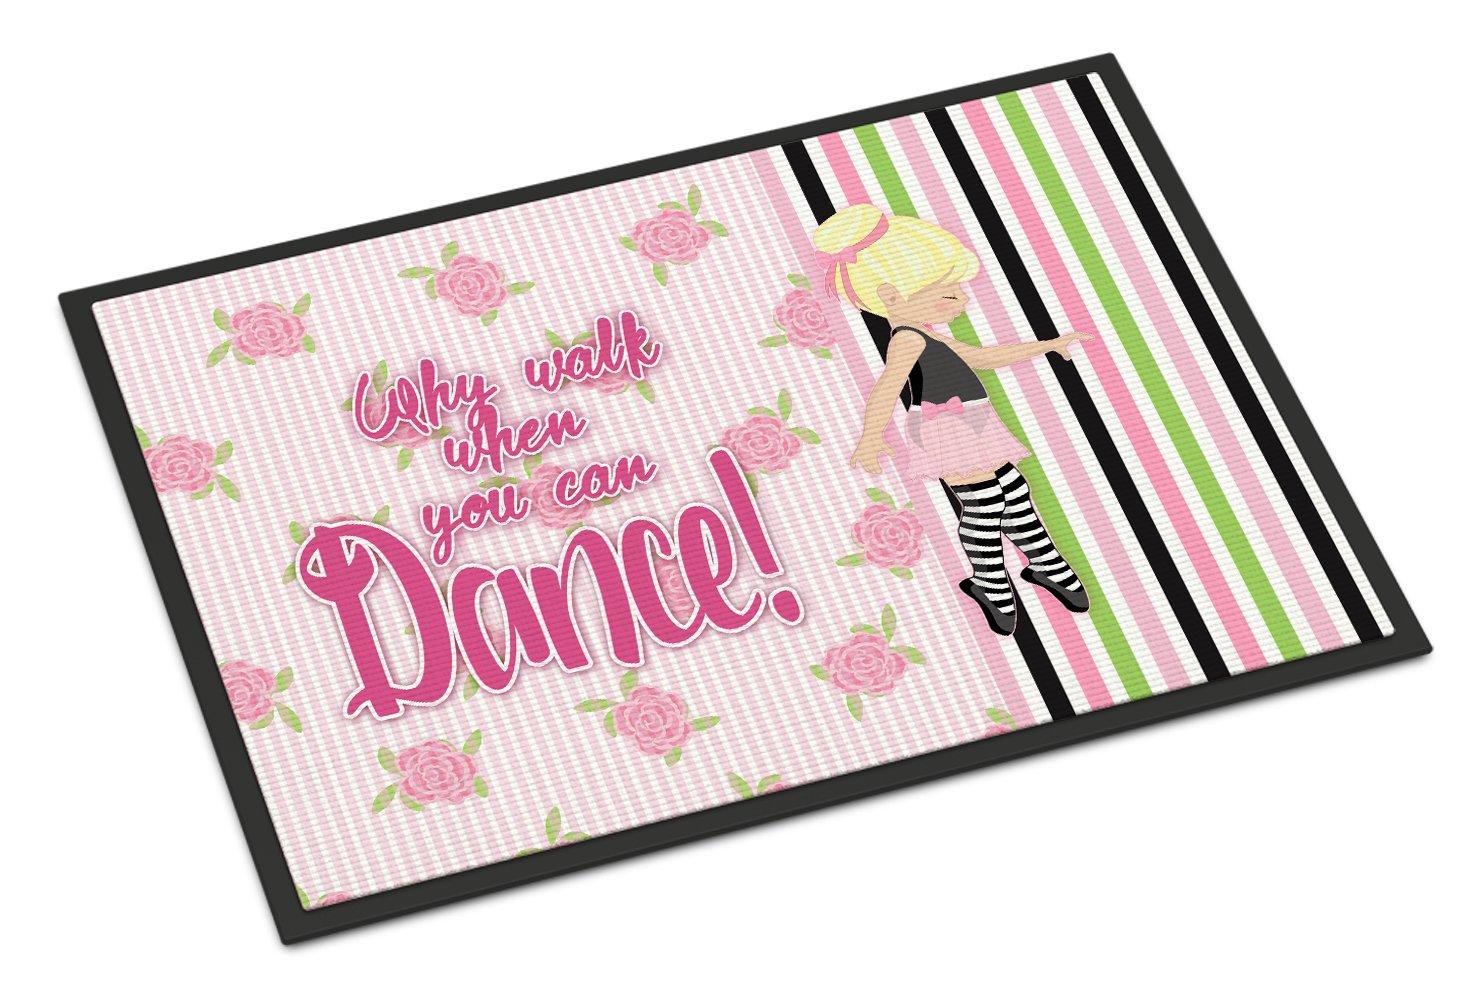 Caroline's Treasures Ballet Dance Stripes Blonde Doormat, 24 H x 36 W'', Multicolor